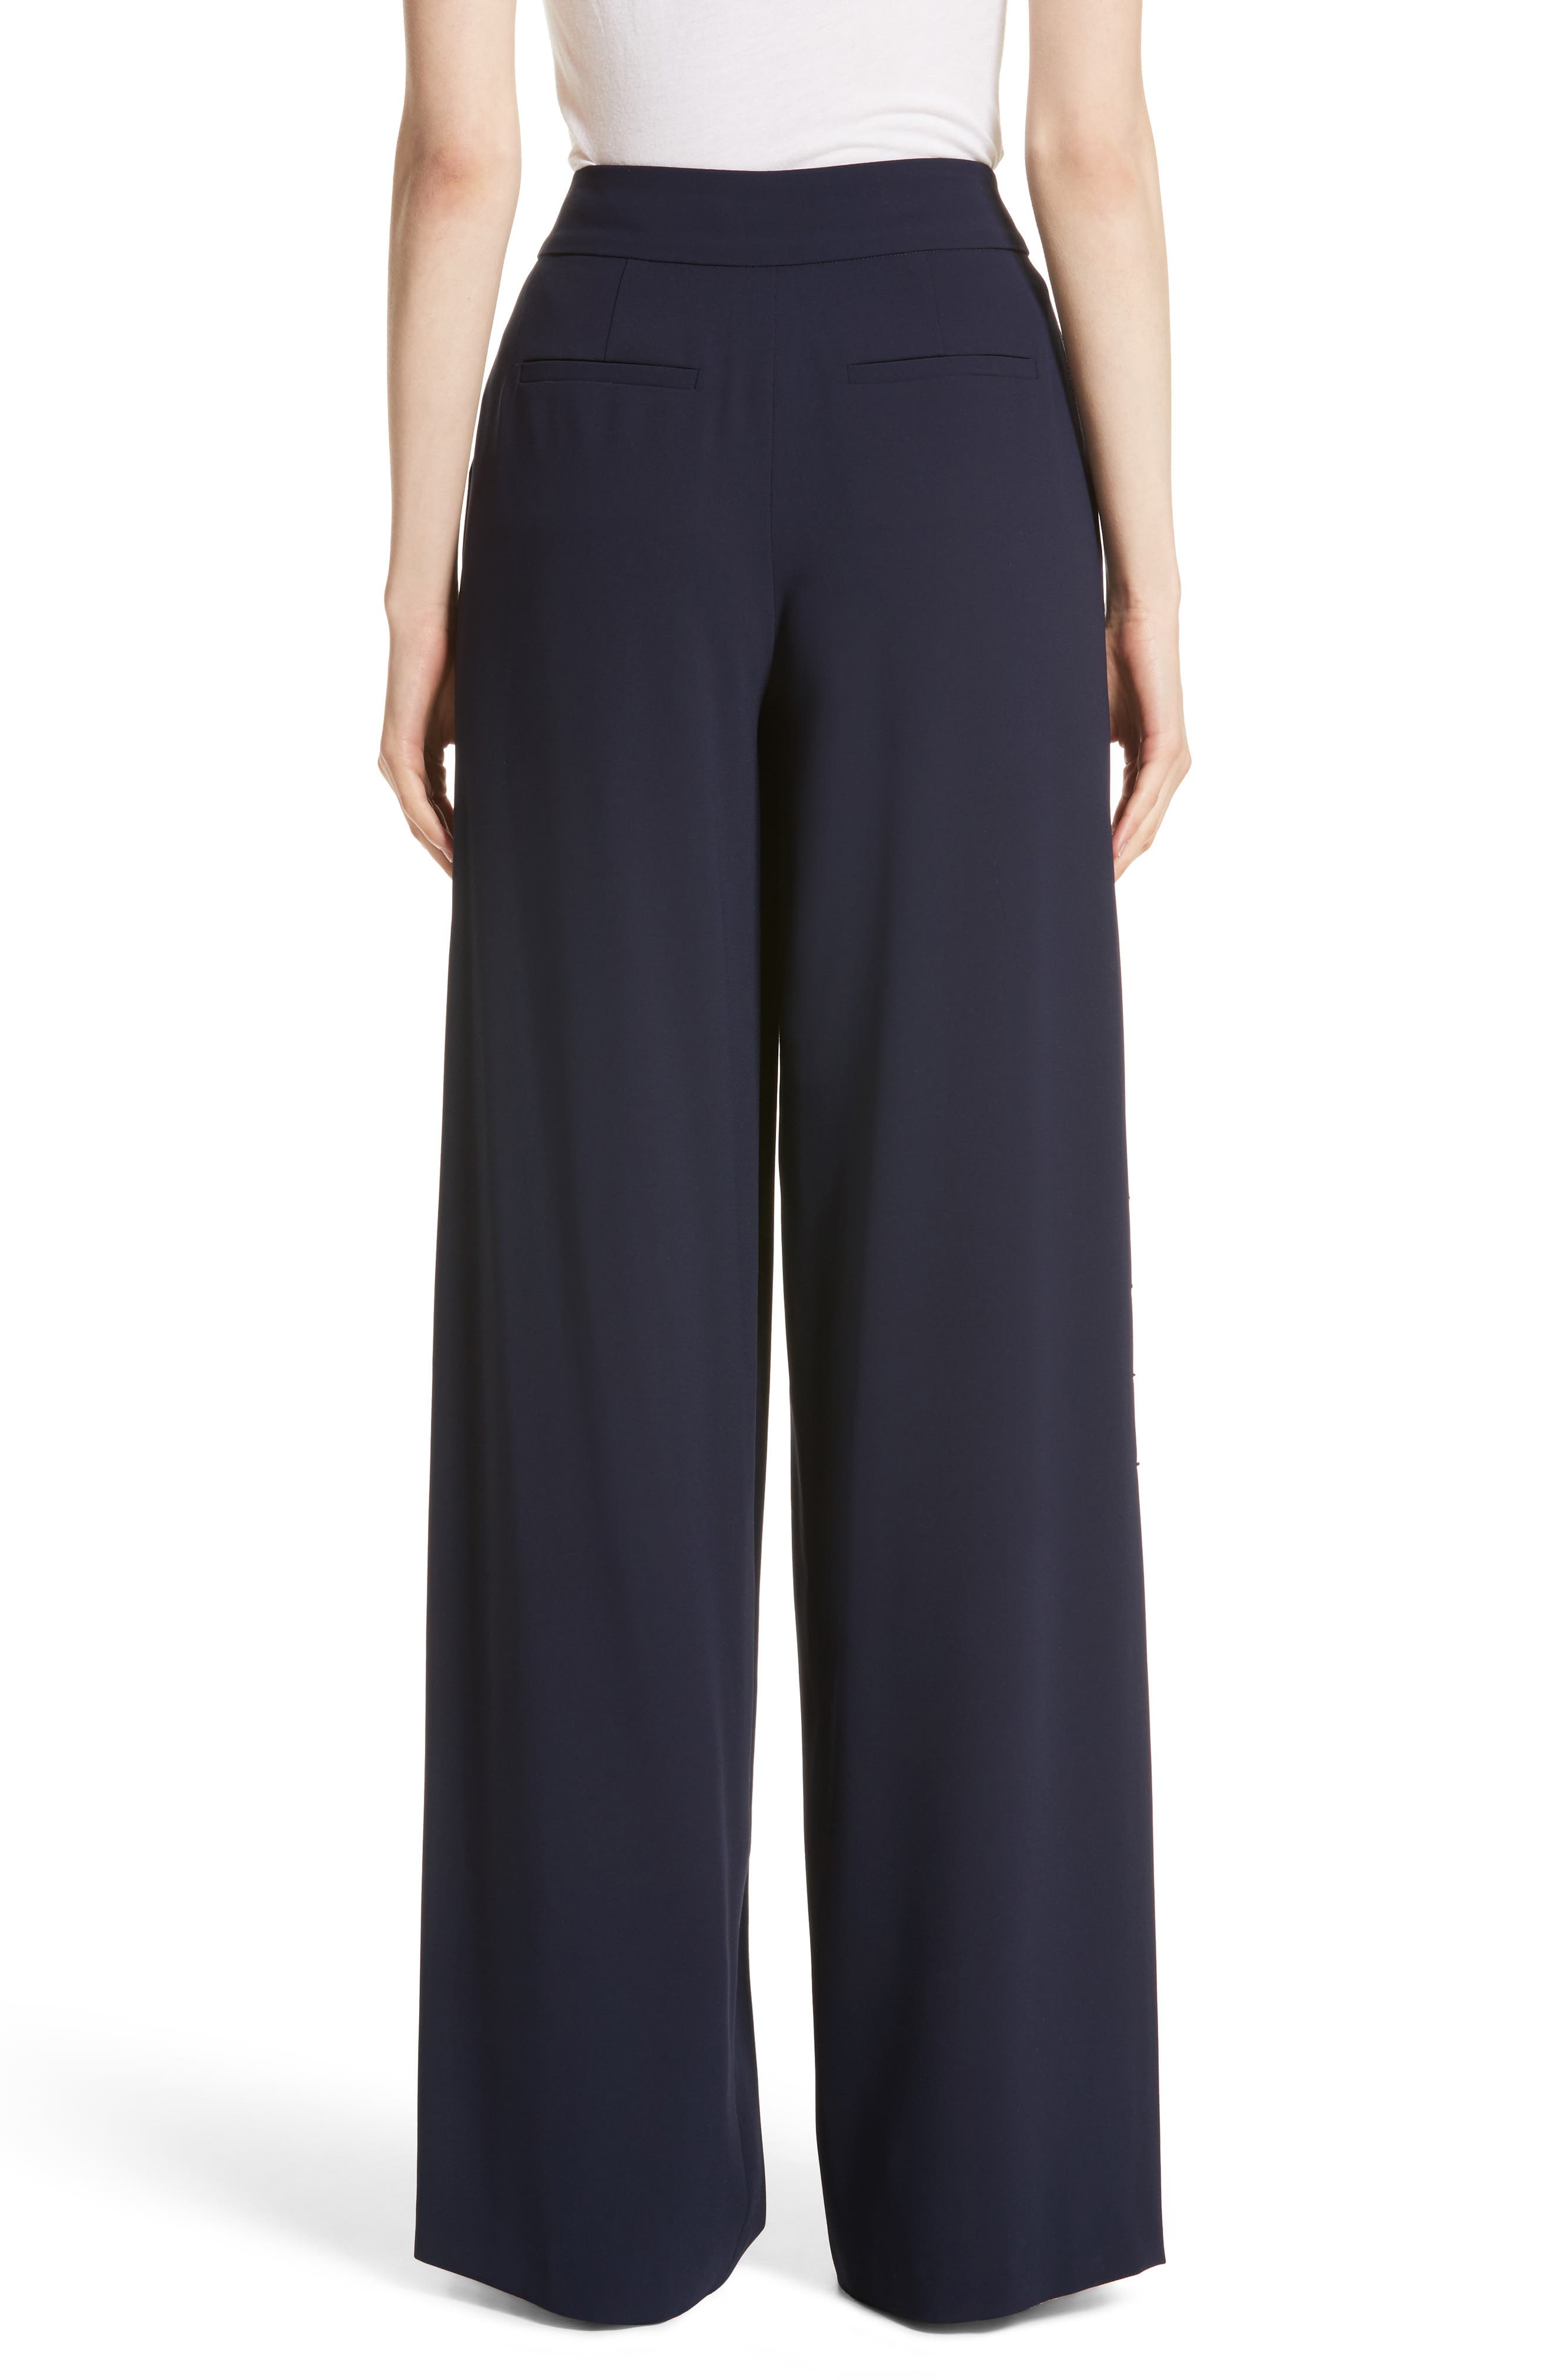 Shavon High Waist Side Slit Flare Pants,                             Alternate thumbnail 2, color,                             400